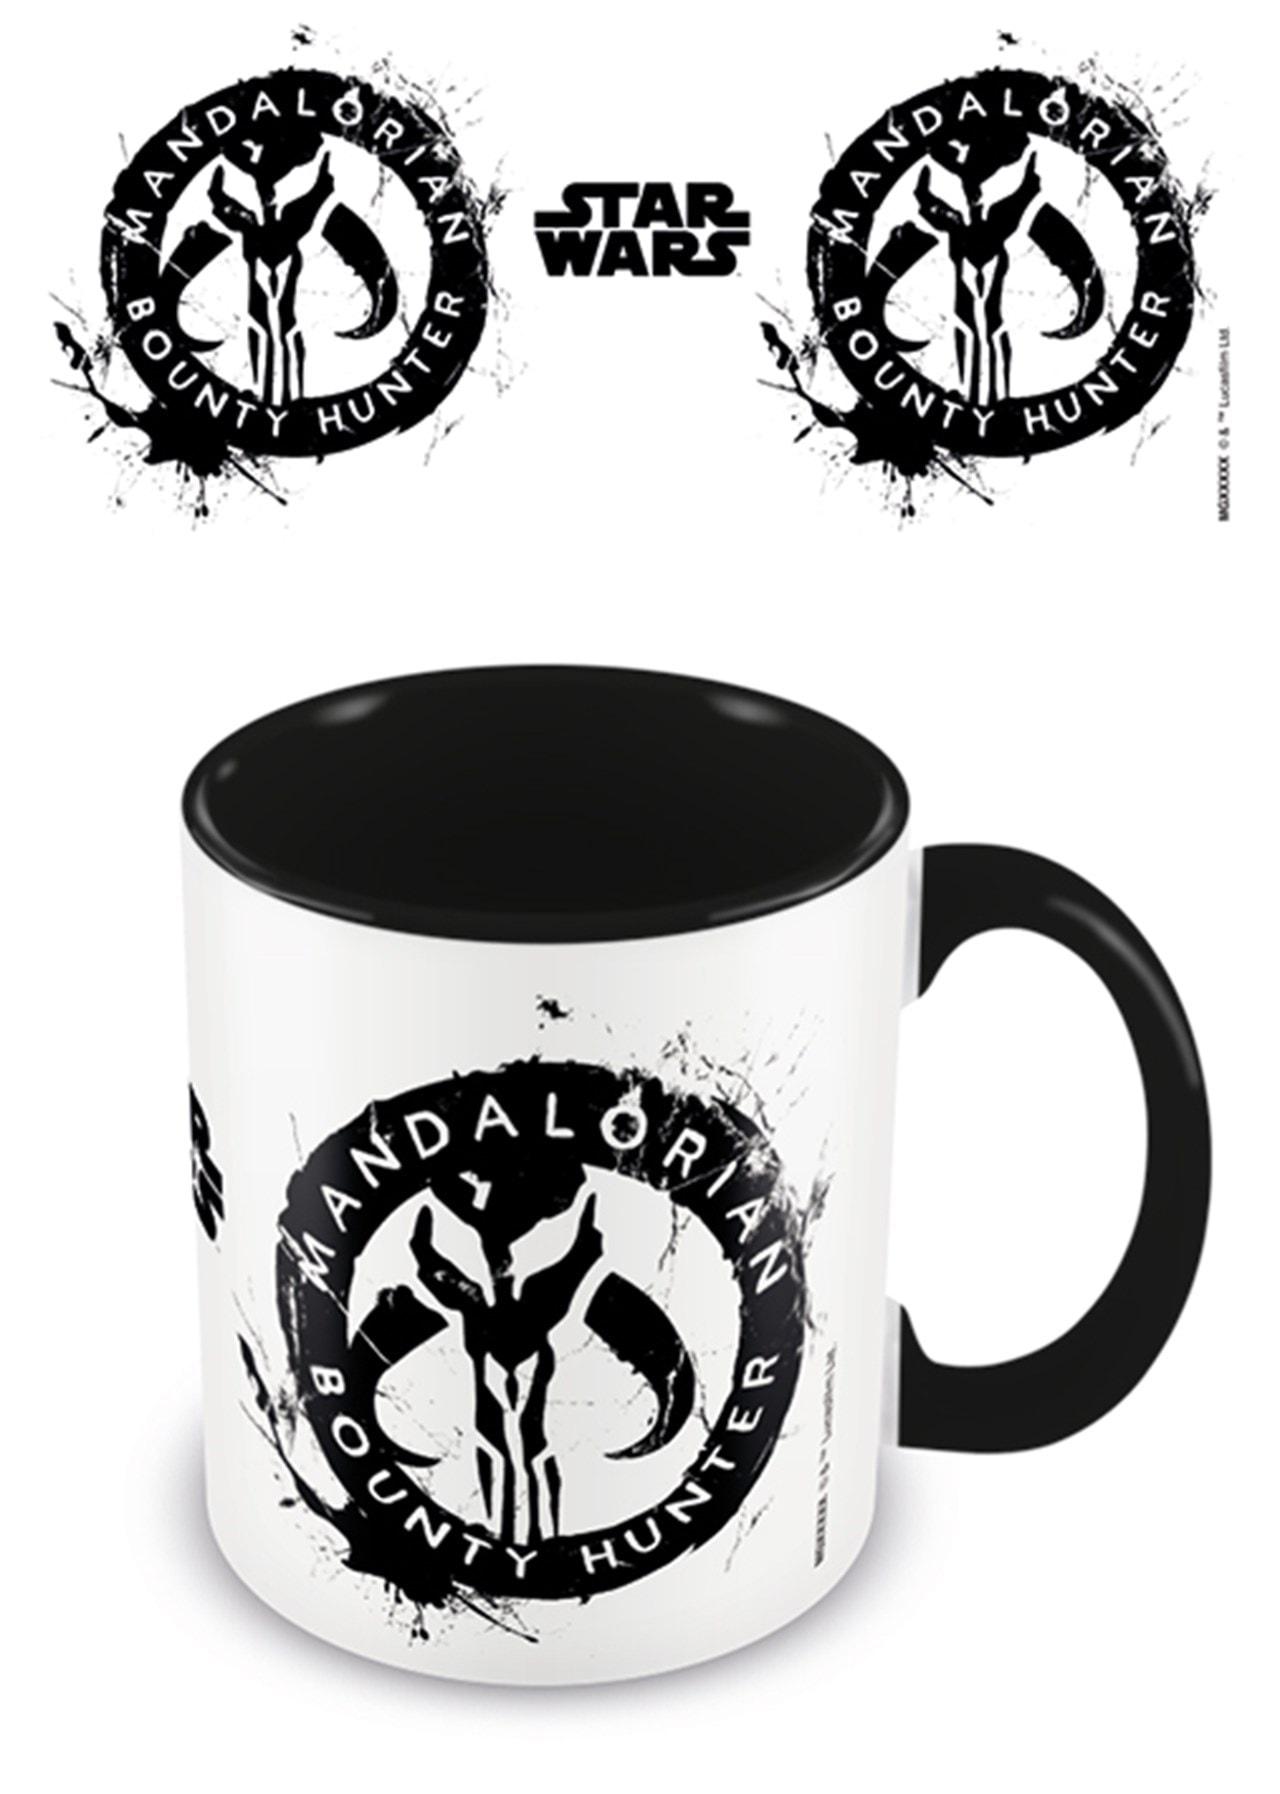 Star Wars: The Mandalorian (Sigil) Mug - 1